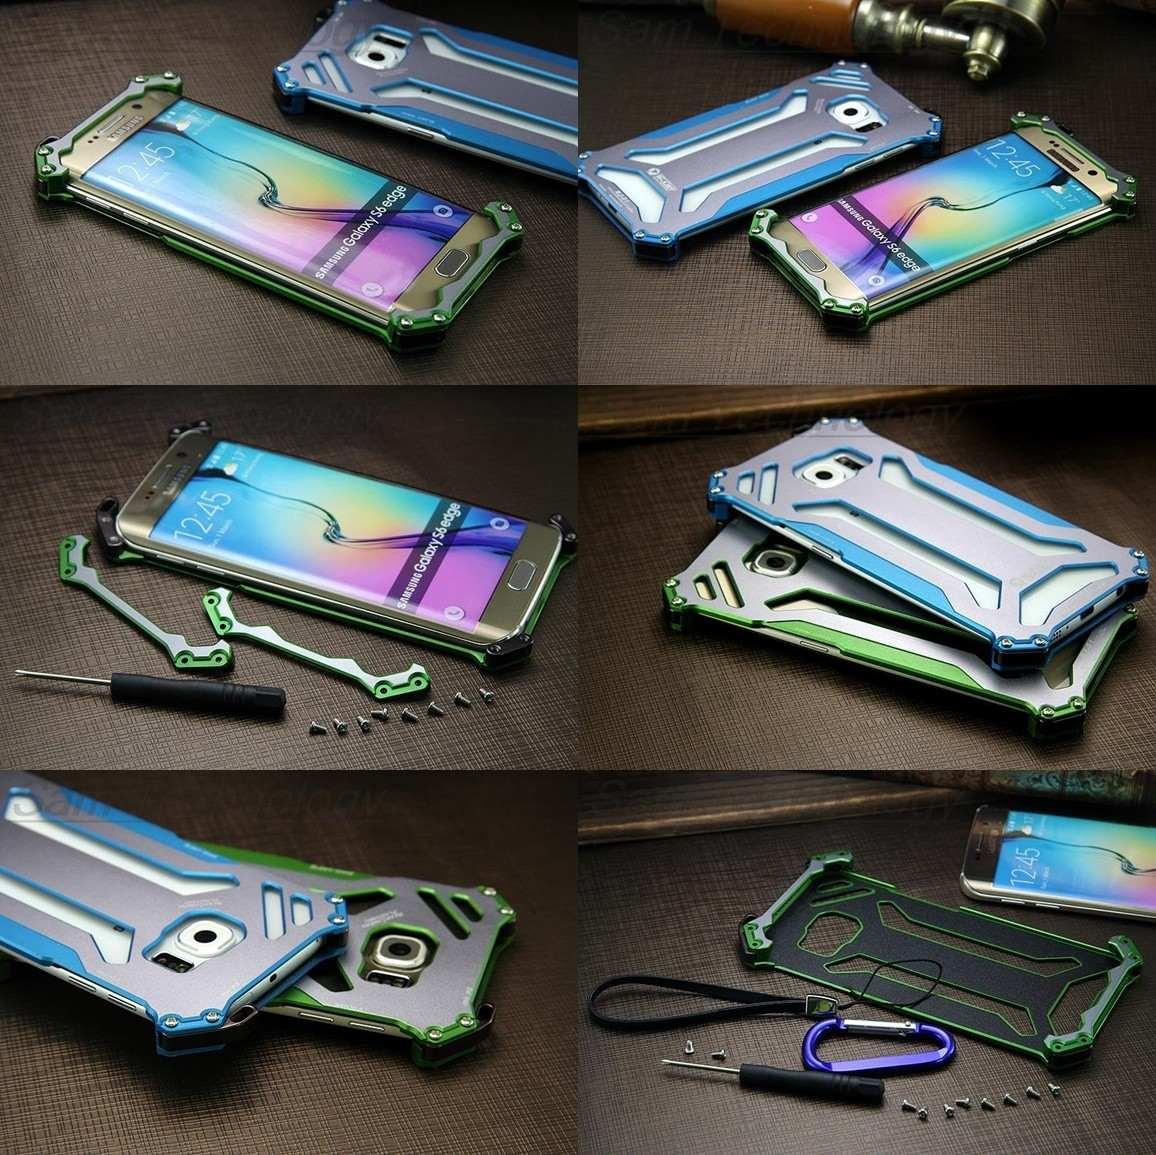 ae8057a7f1fe2 Capa Bumper Metal R-just Celular Samsung Galaxy S7 Edge G935 - R ...